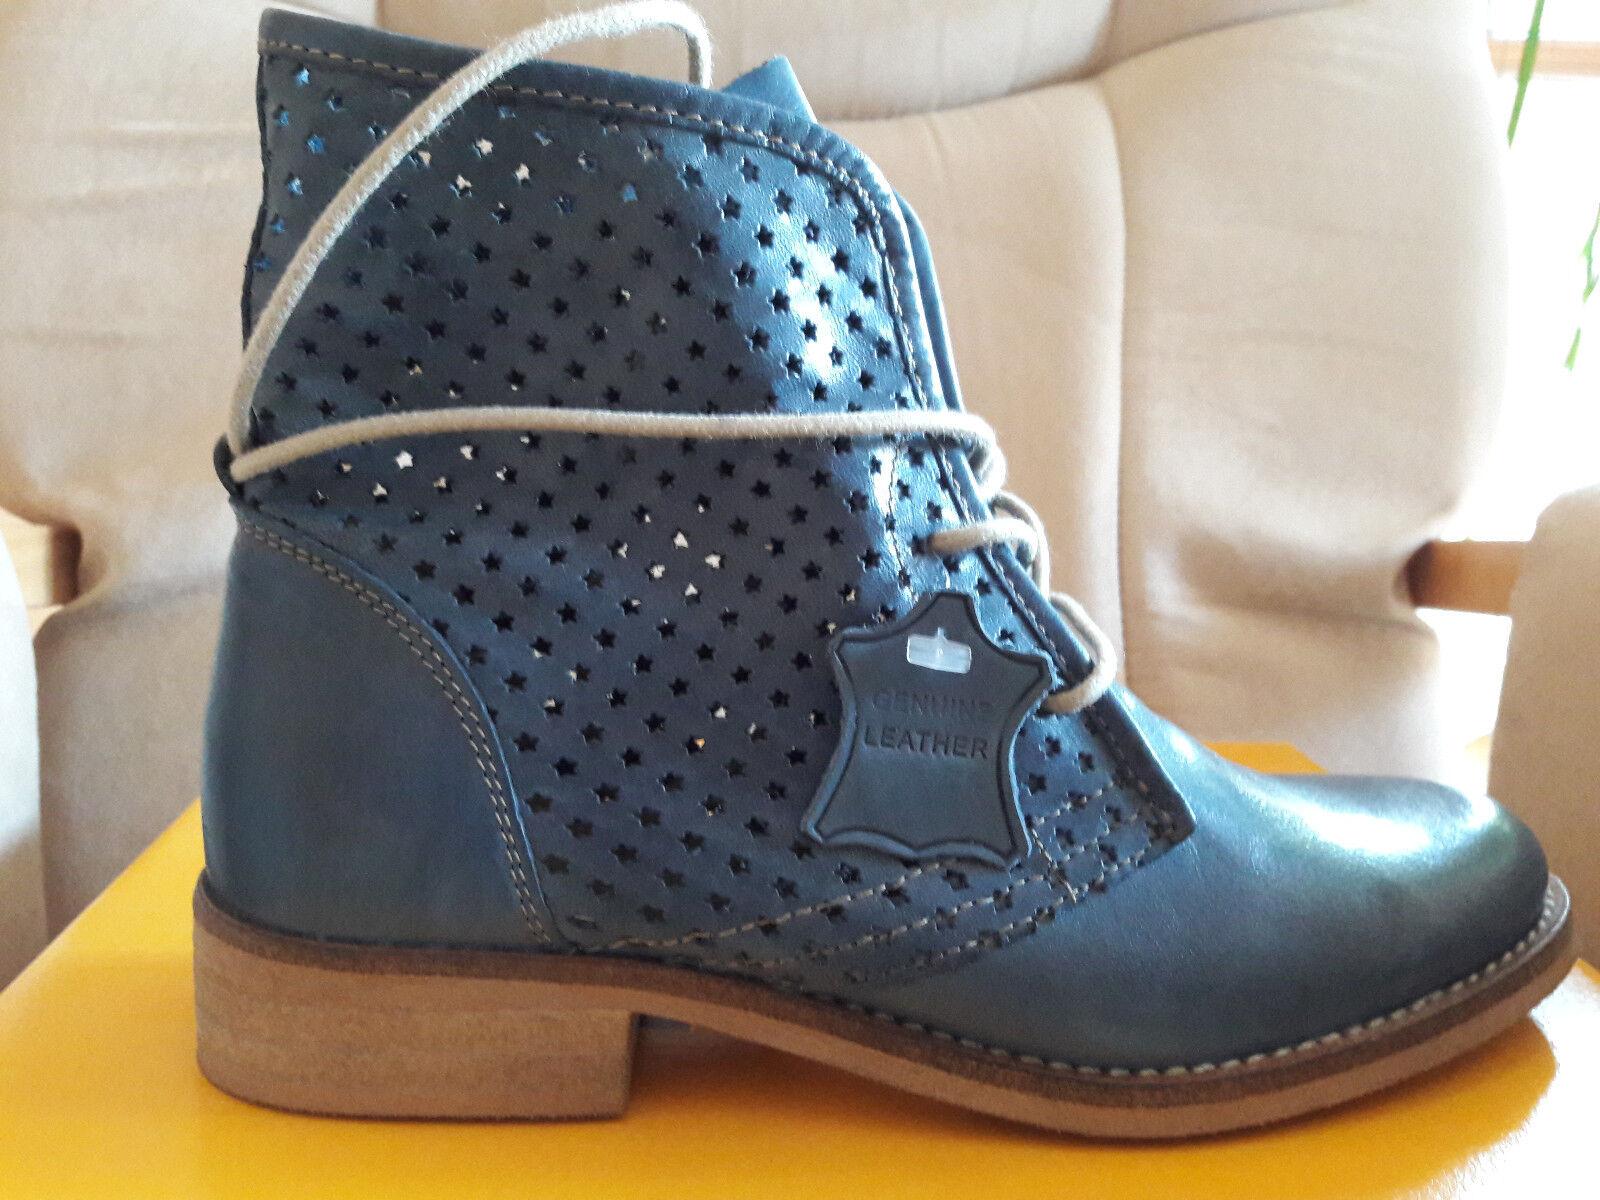 Stiefelette Stiefelette Stiefelette Damen, Echtleder, Größe 37, Farbe jeansblau, neu 1d6d52